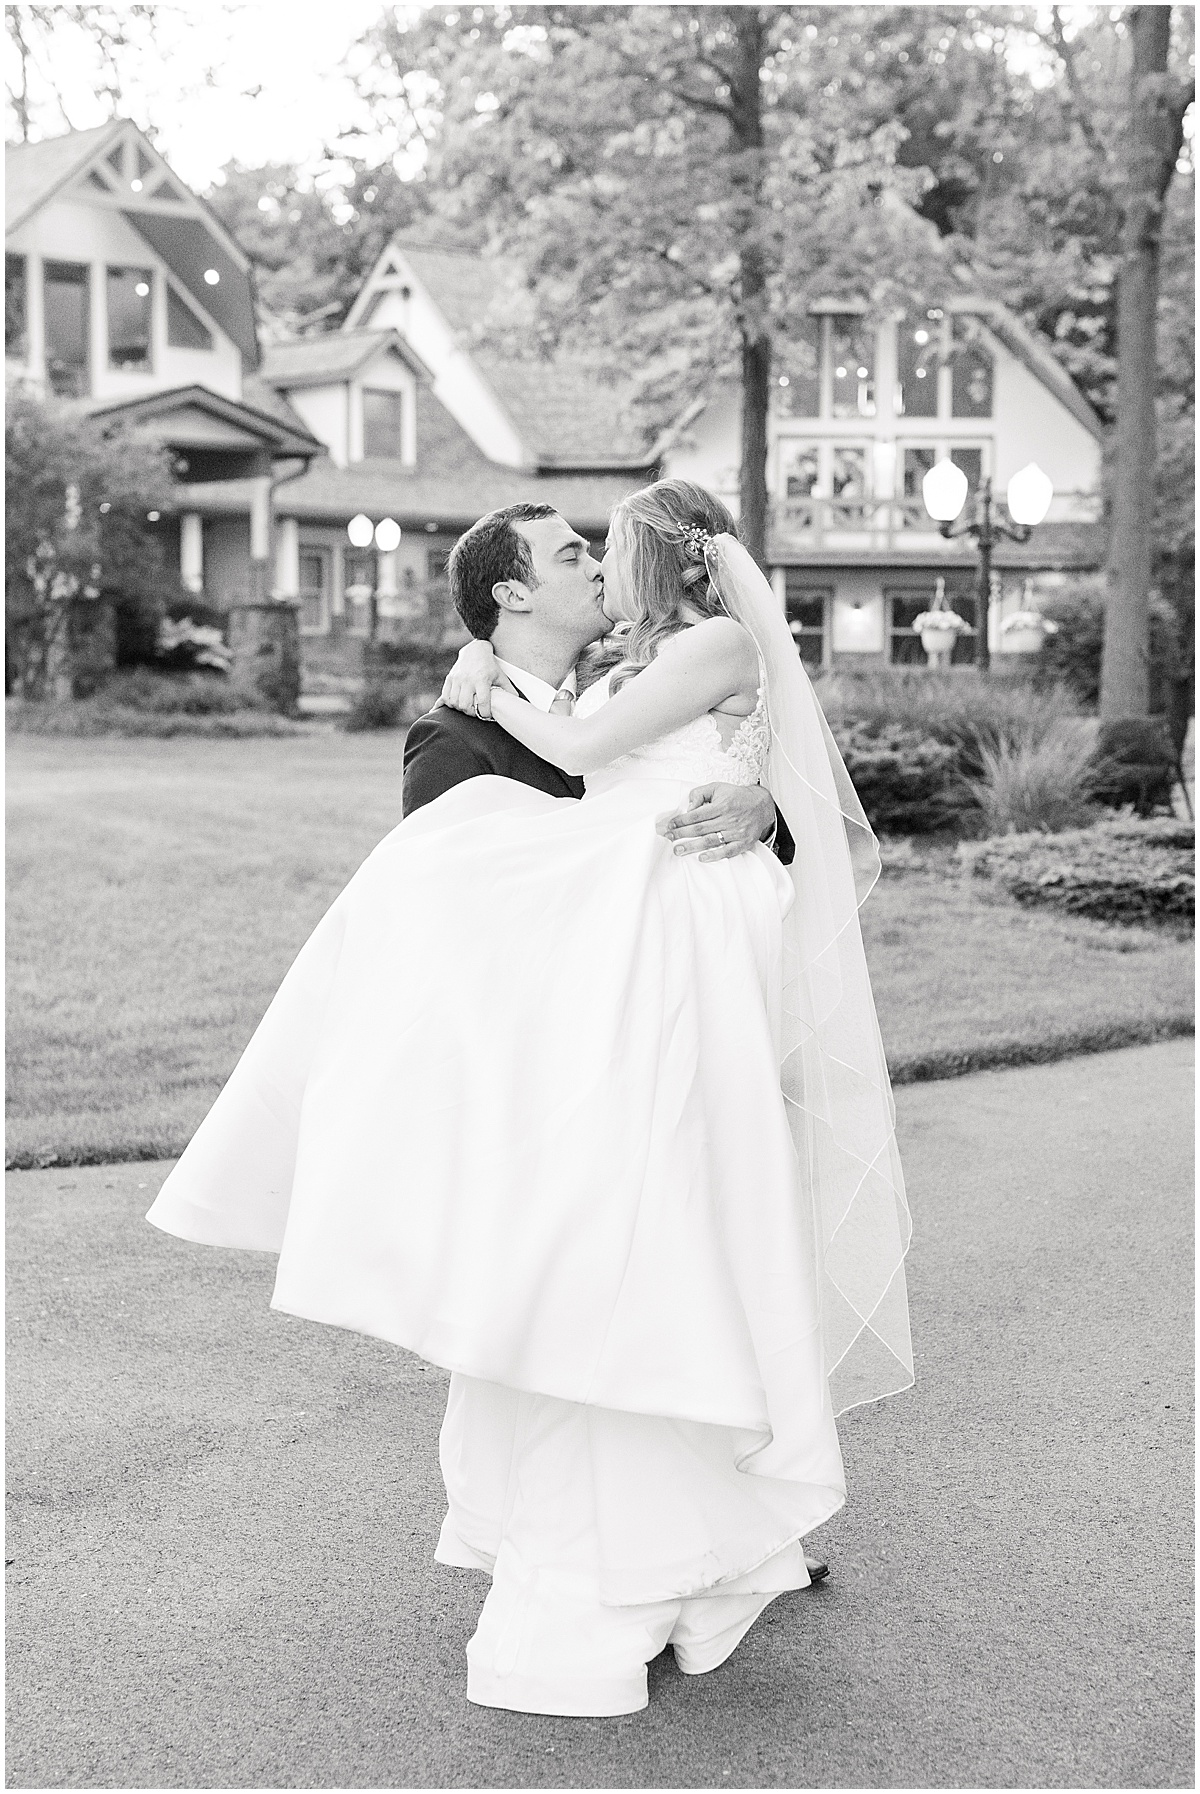 Sunset photos after Lizton Lodge Wedding in Lizton, Indiana